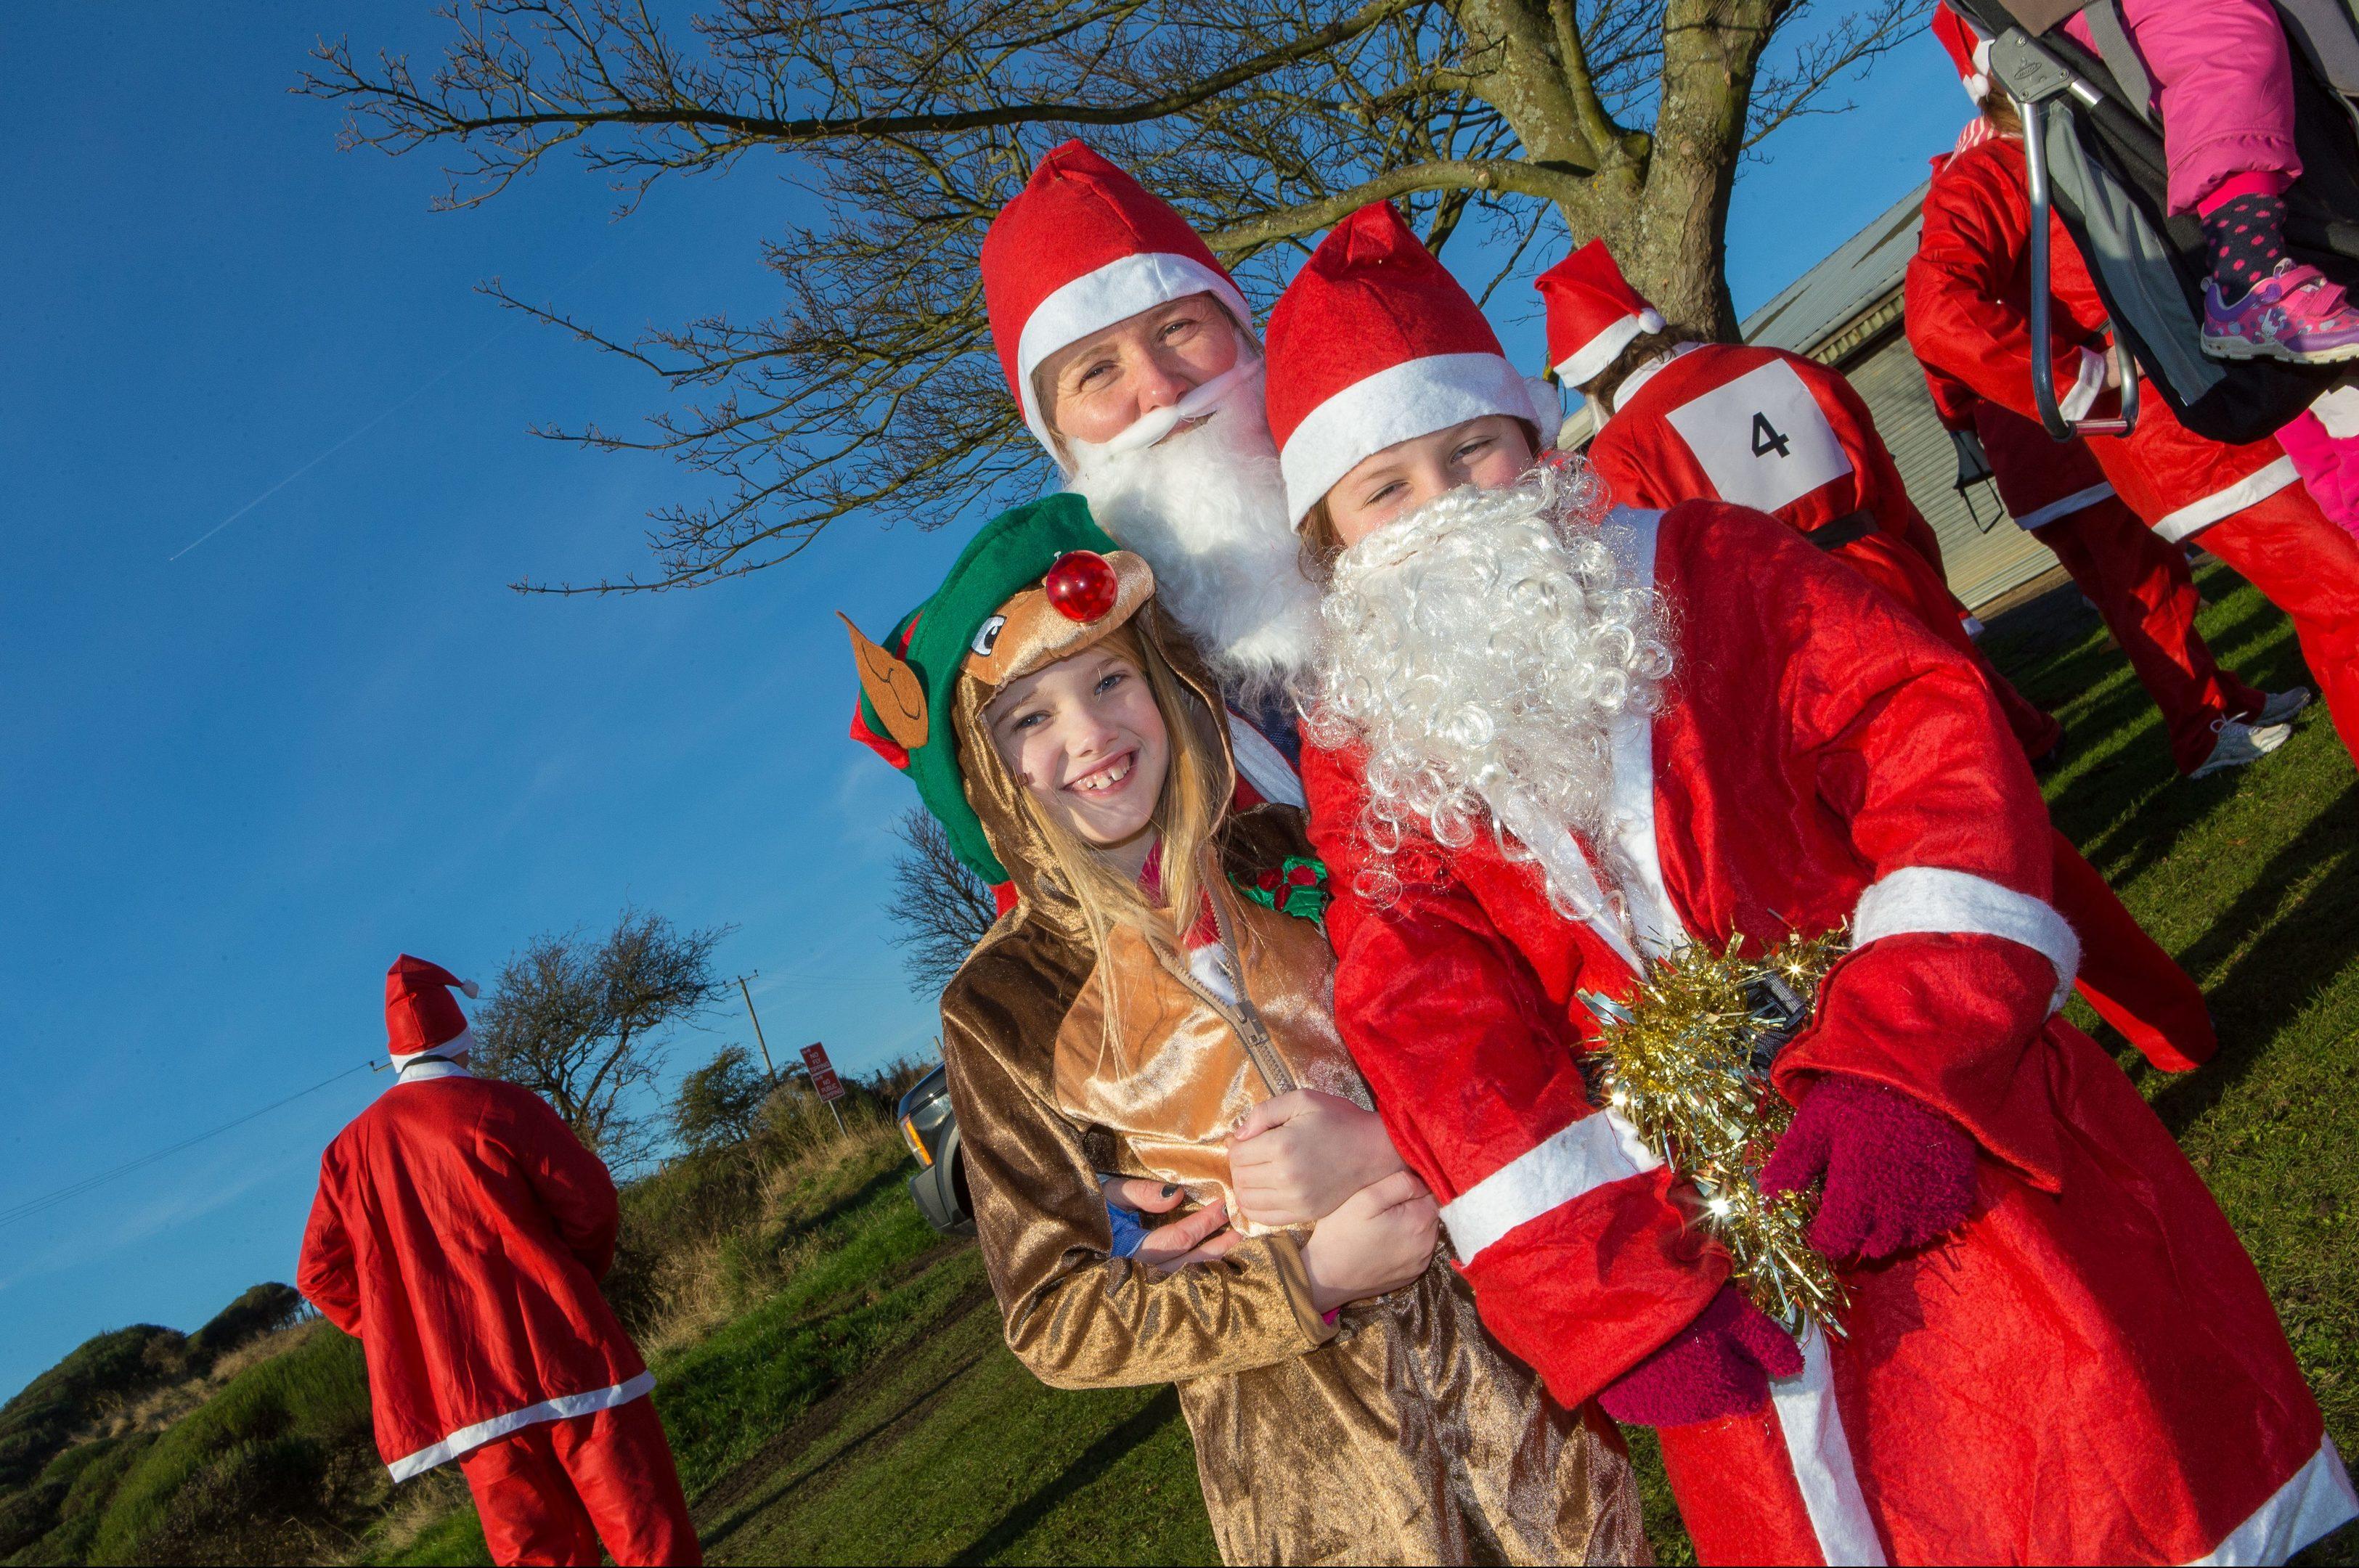 Fiona MacTaggart with kids Mairi MacTaggart, 8, and Evie Sakes ,9,  at the Santa Fun Run in Kinghorn.